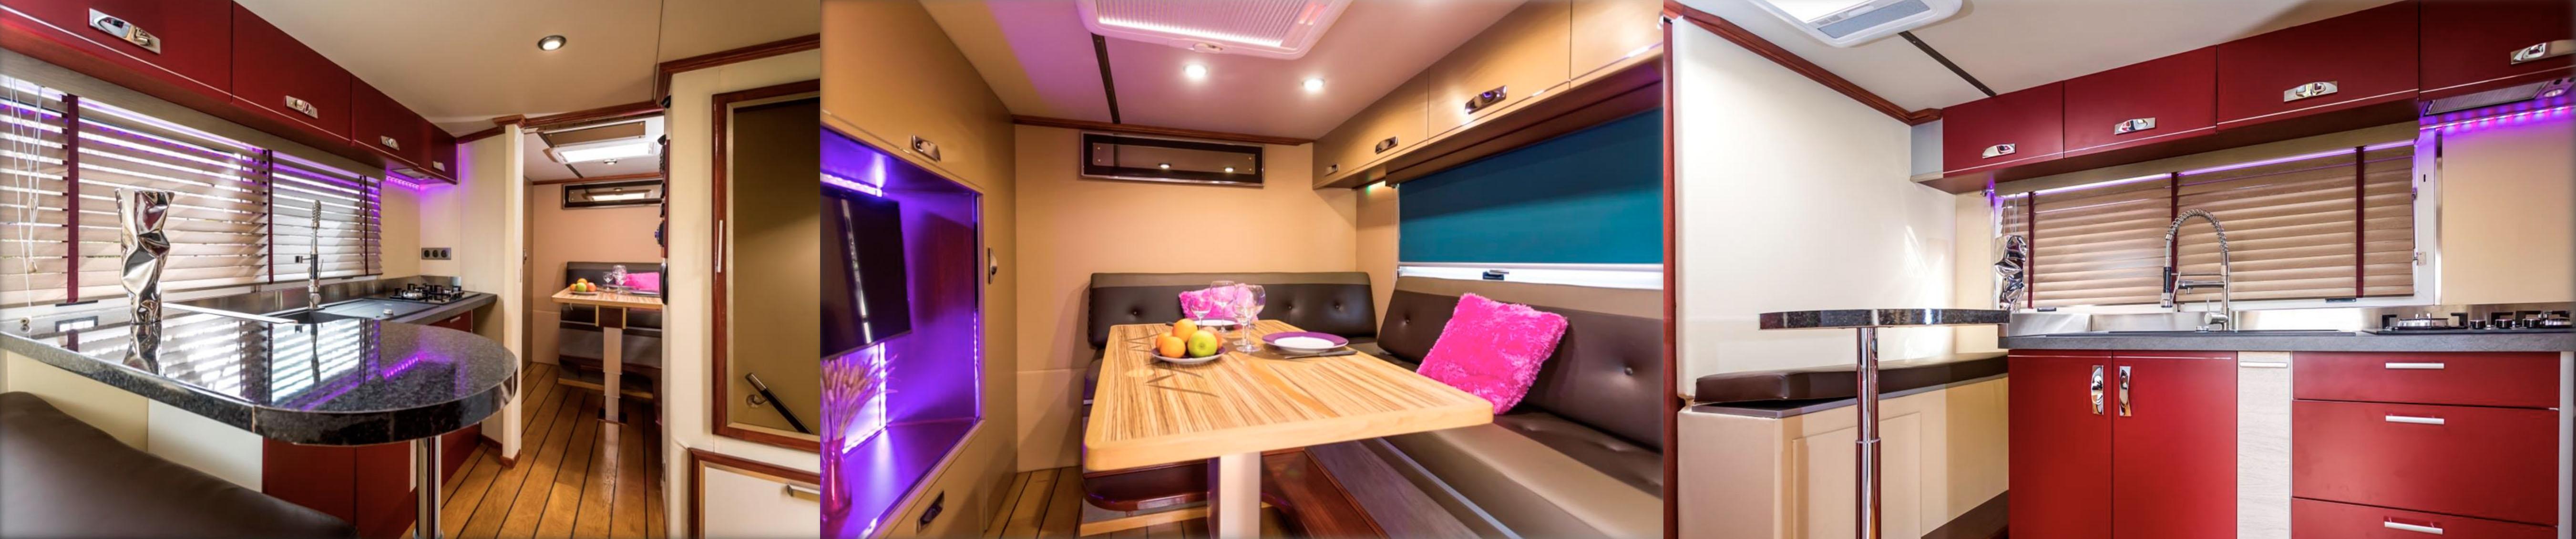 Interieur personalisation camping-car remorque food truck